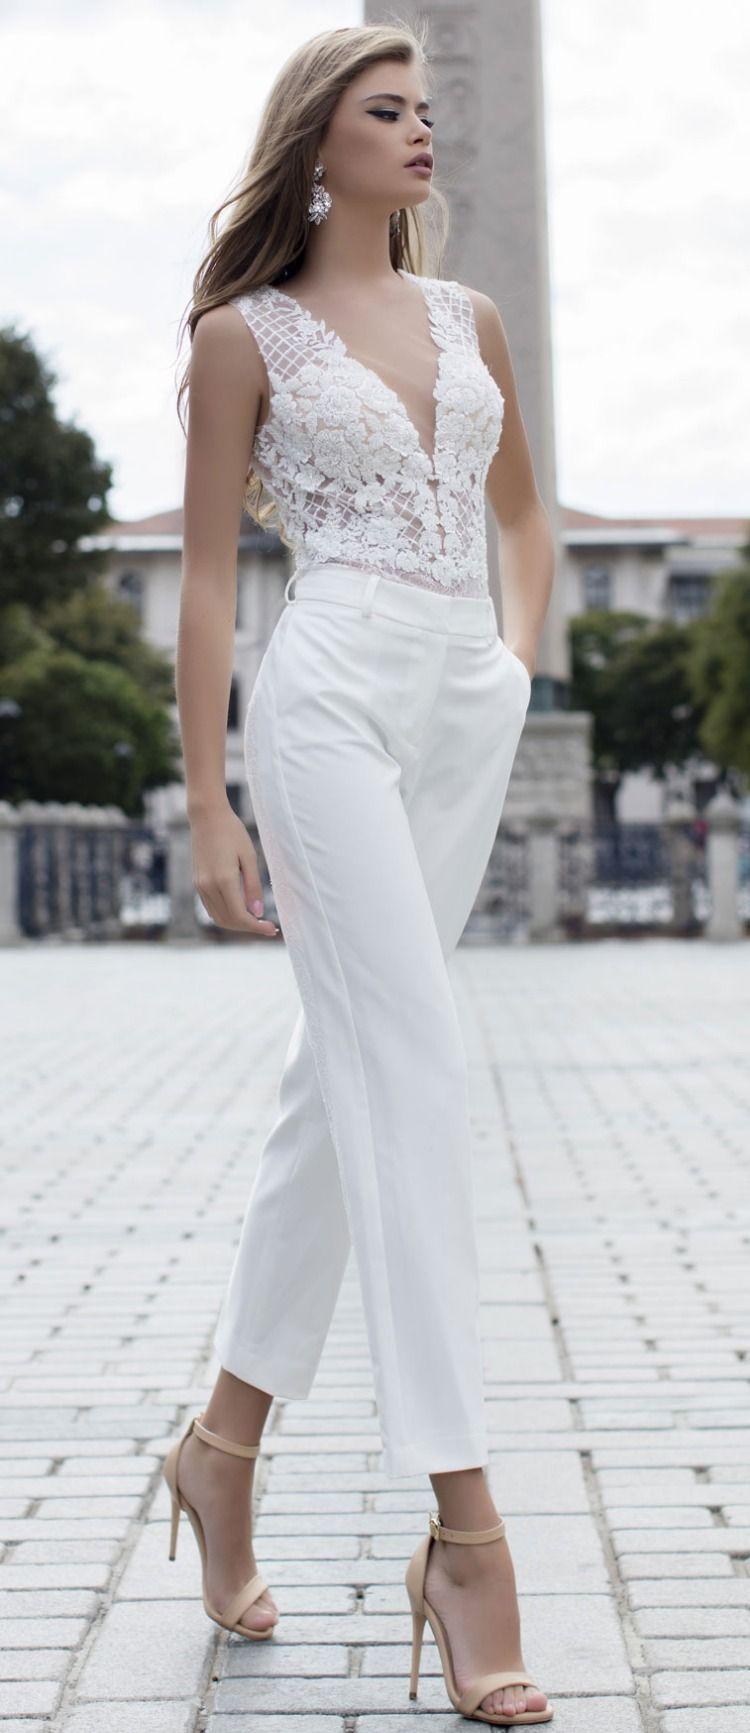 Liretta Wedding Dresses – Neruim Collection